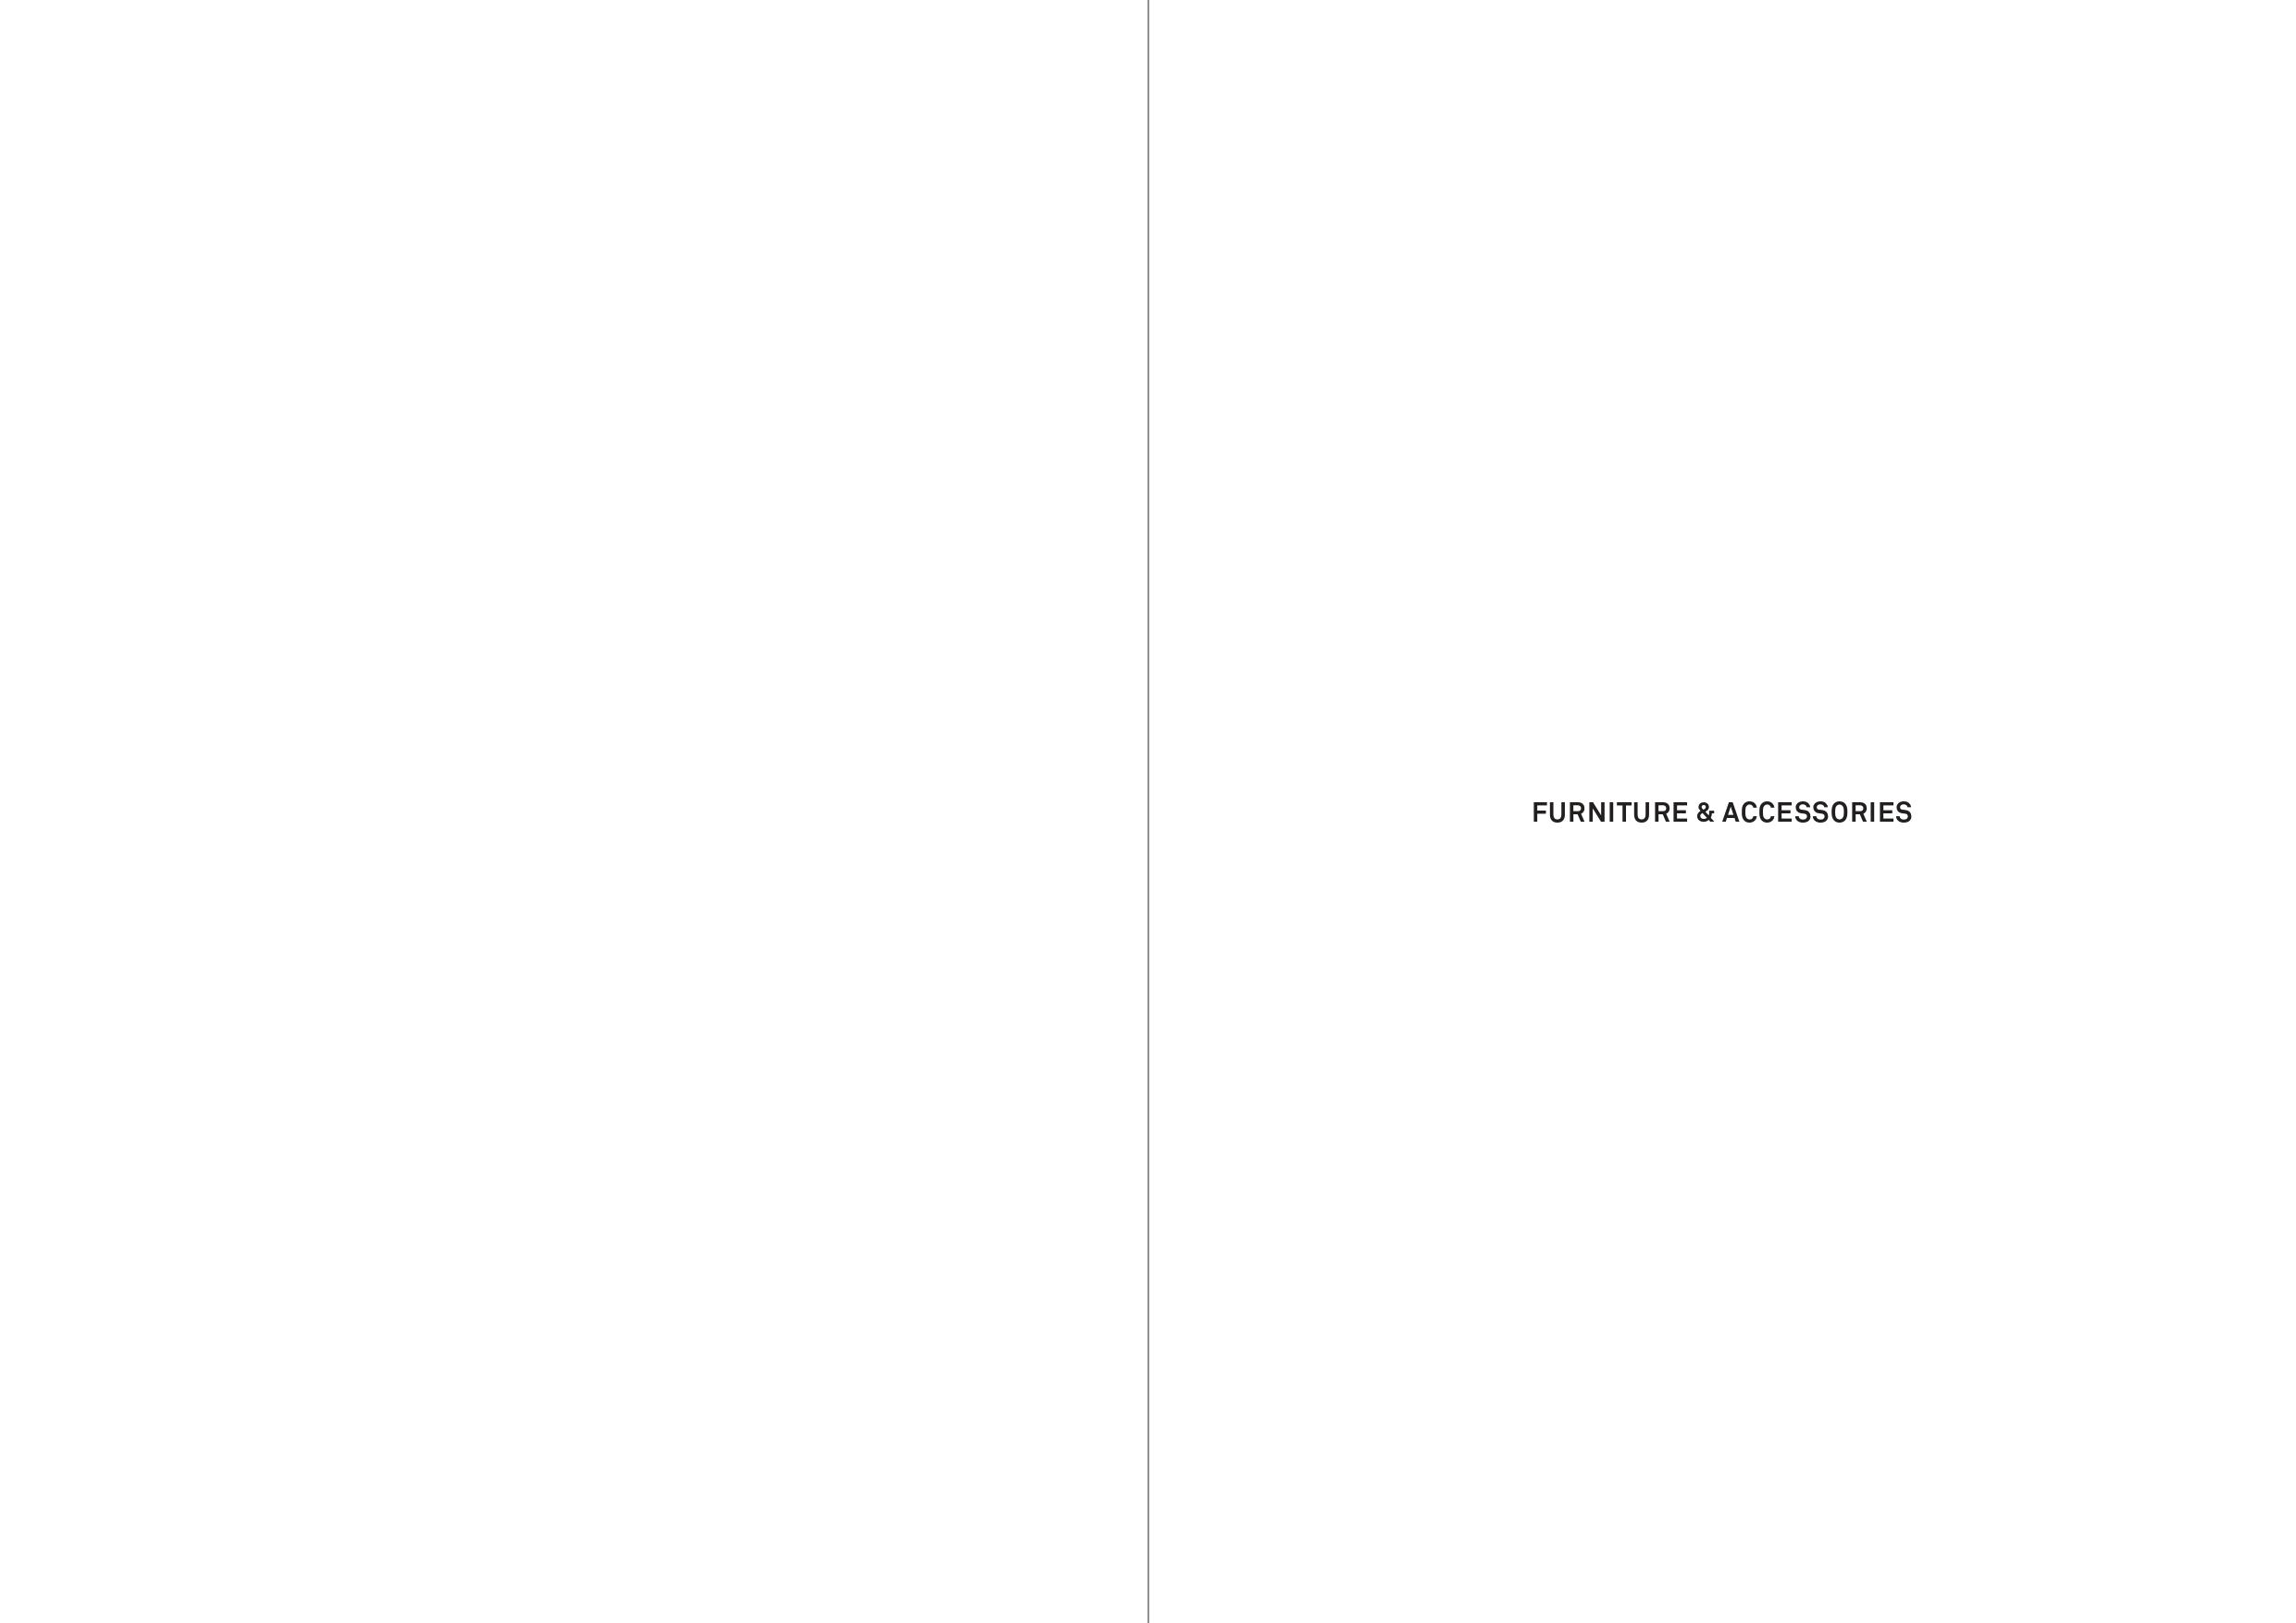 Frama l 2019 l general catalogue_page-0004.jpg